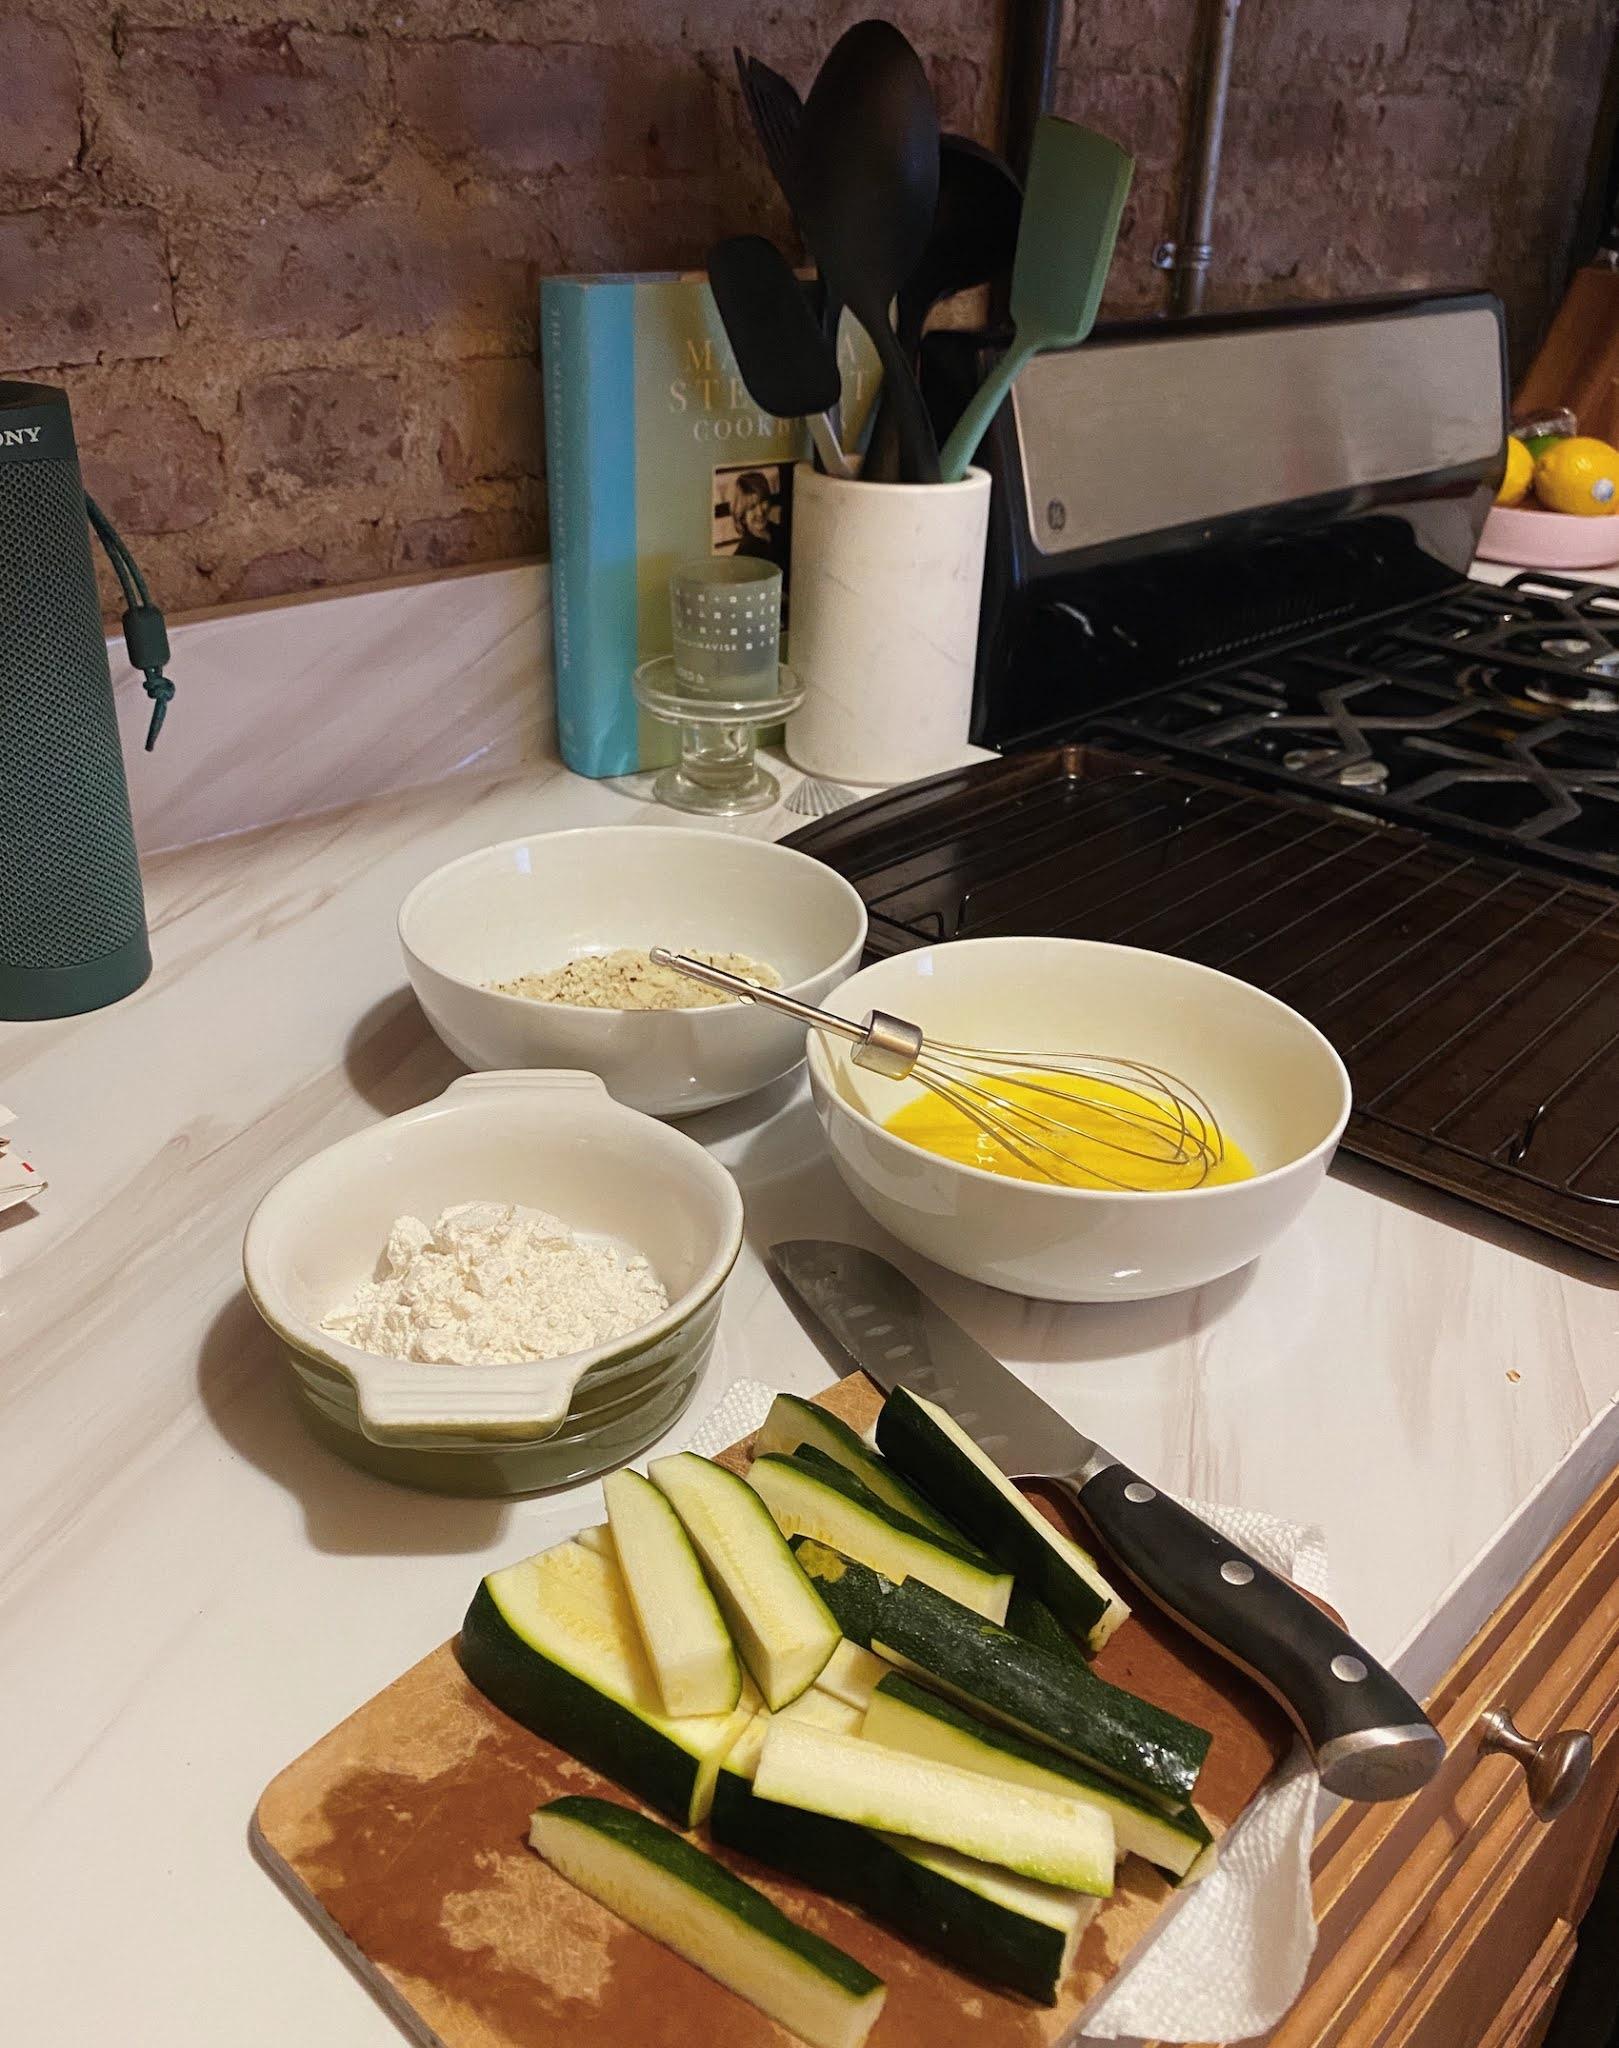 fran acciardo easy baked zucchini fries and homemade lemon garlic aioli